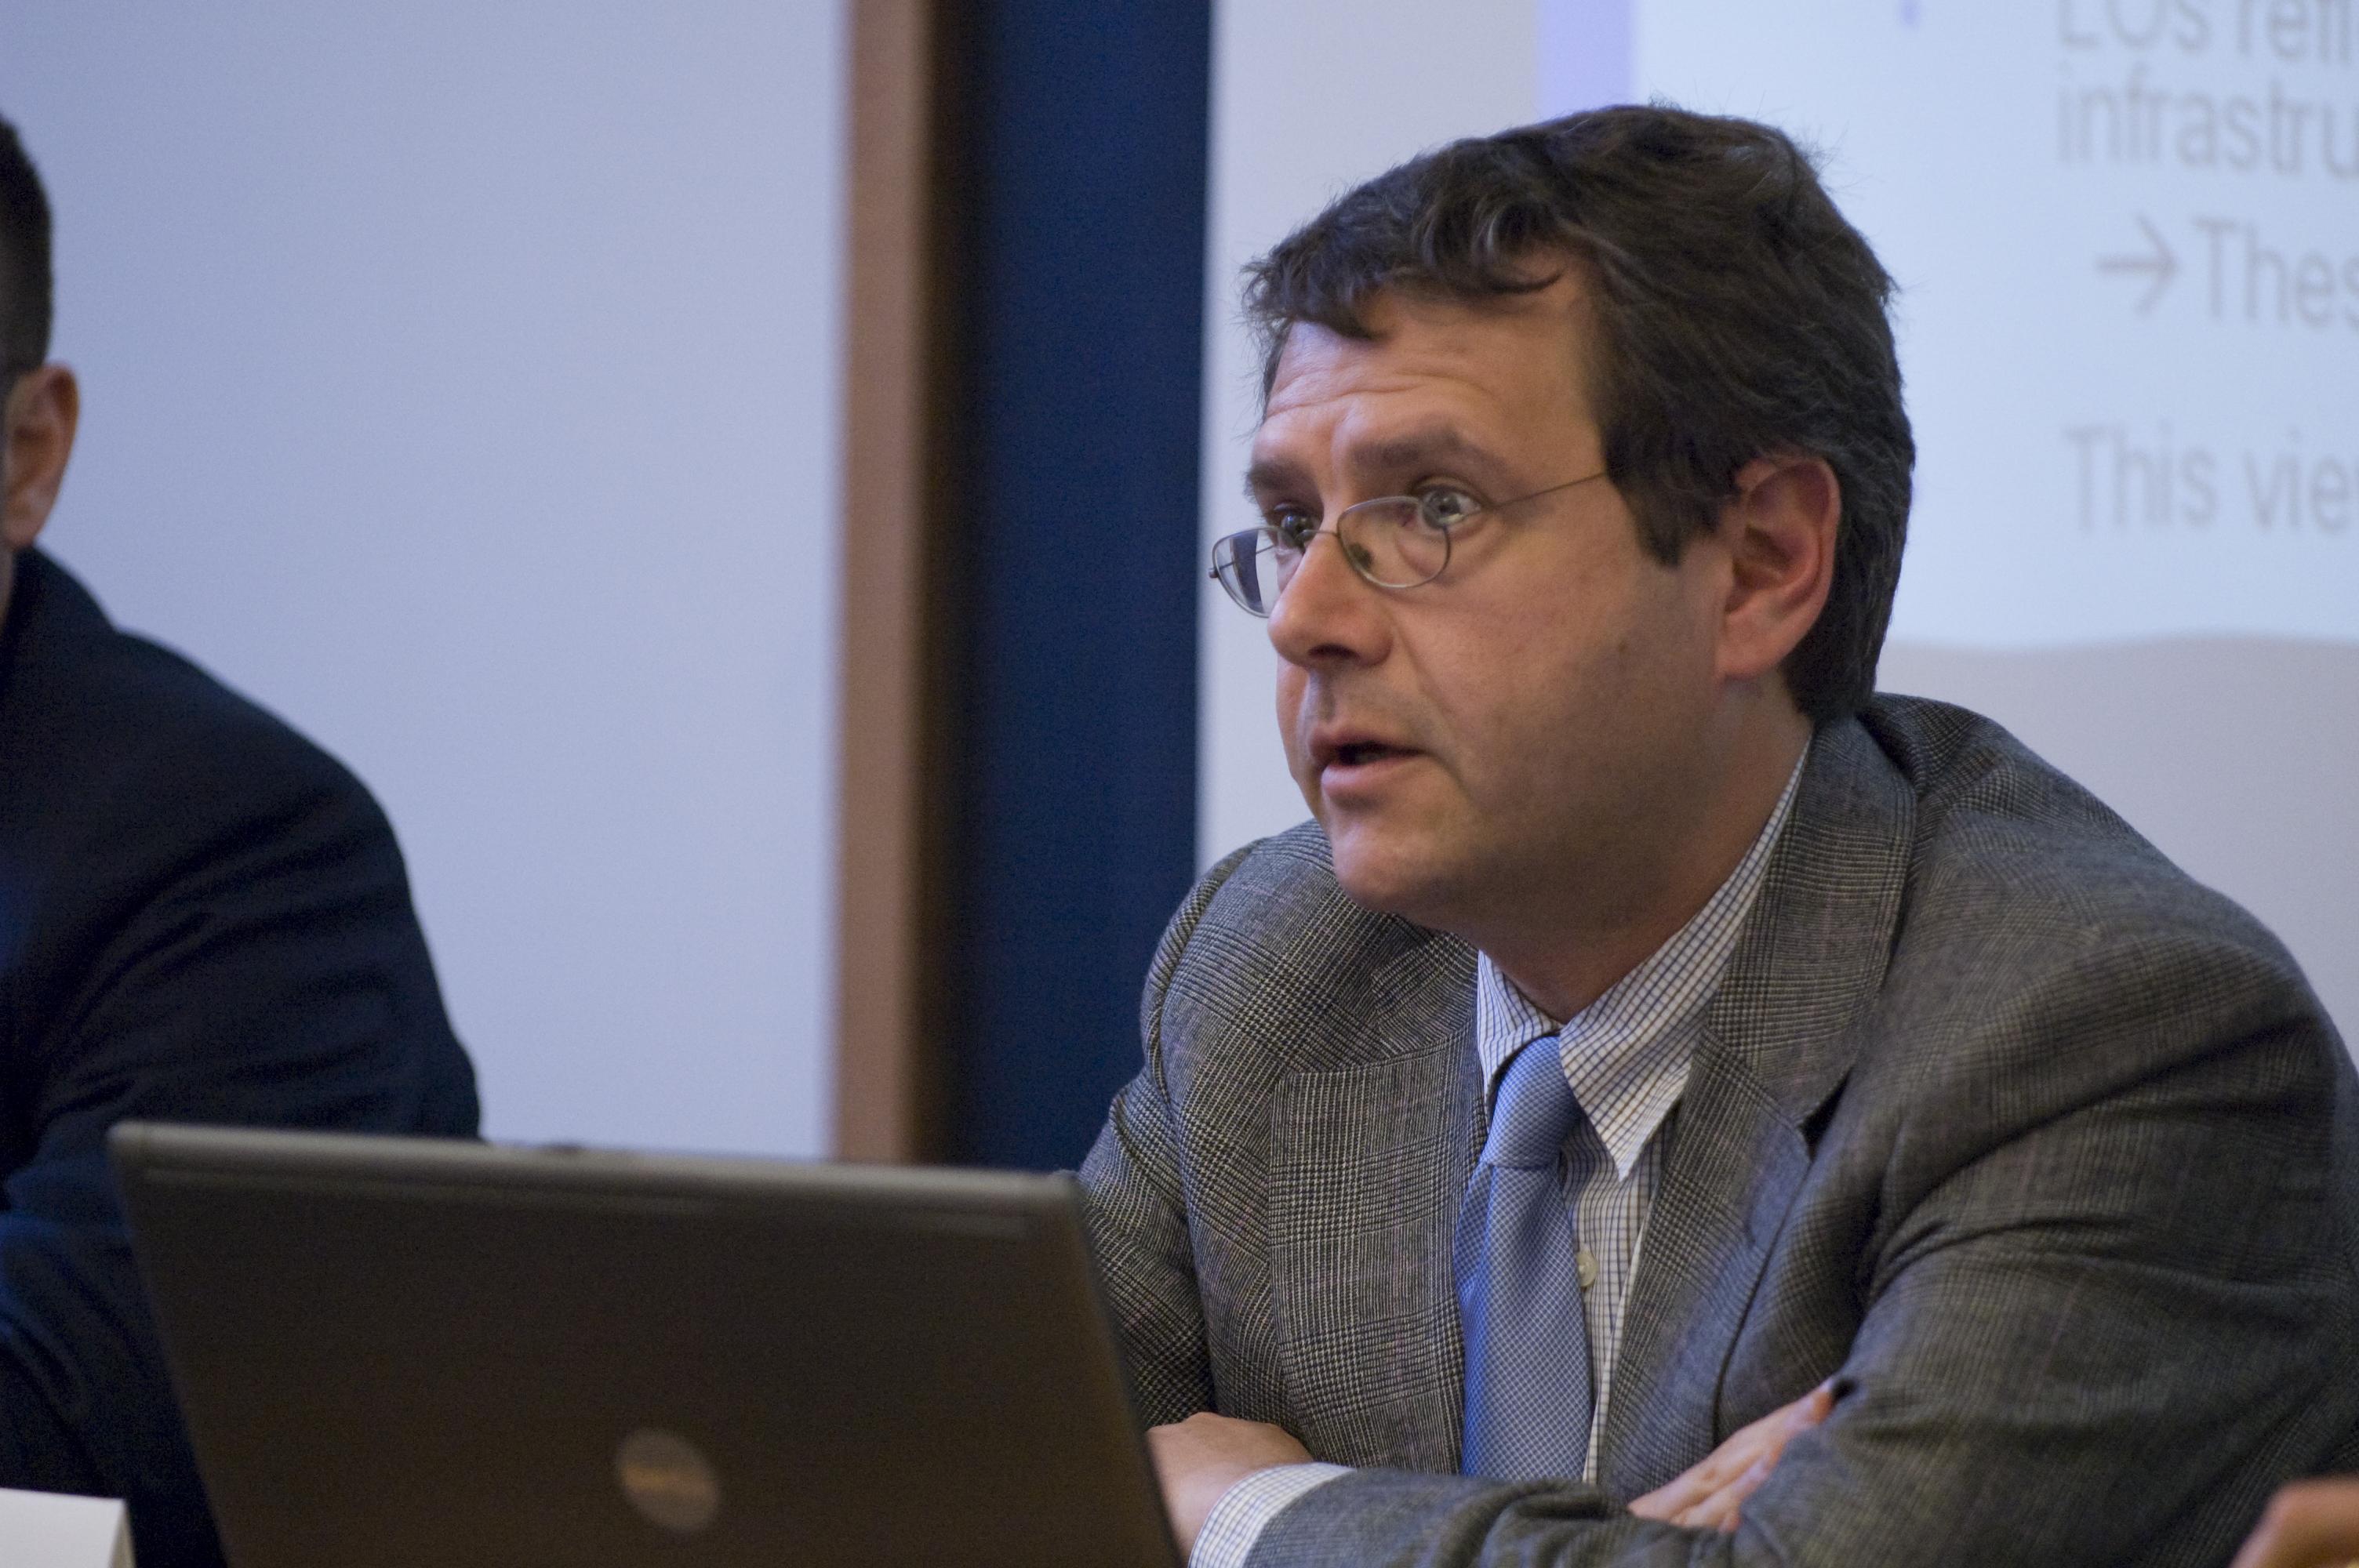 Harvard Econ. Prof. Andrei Shleifer